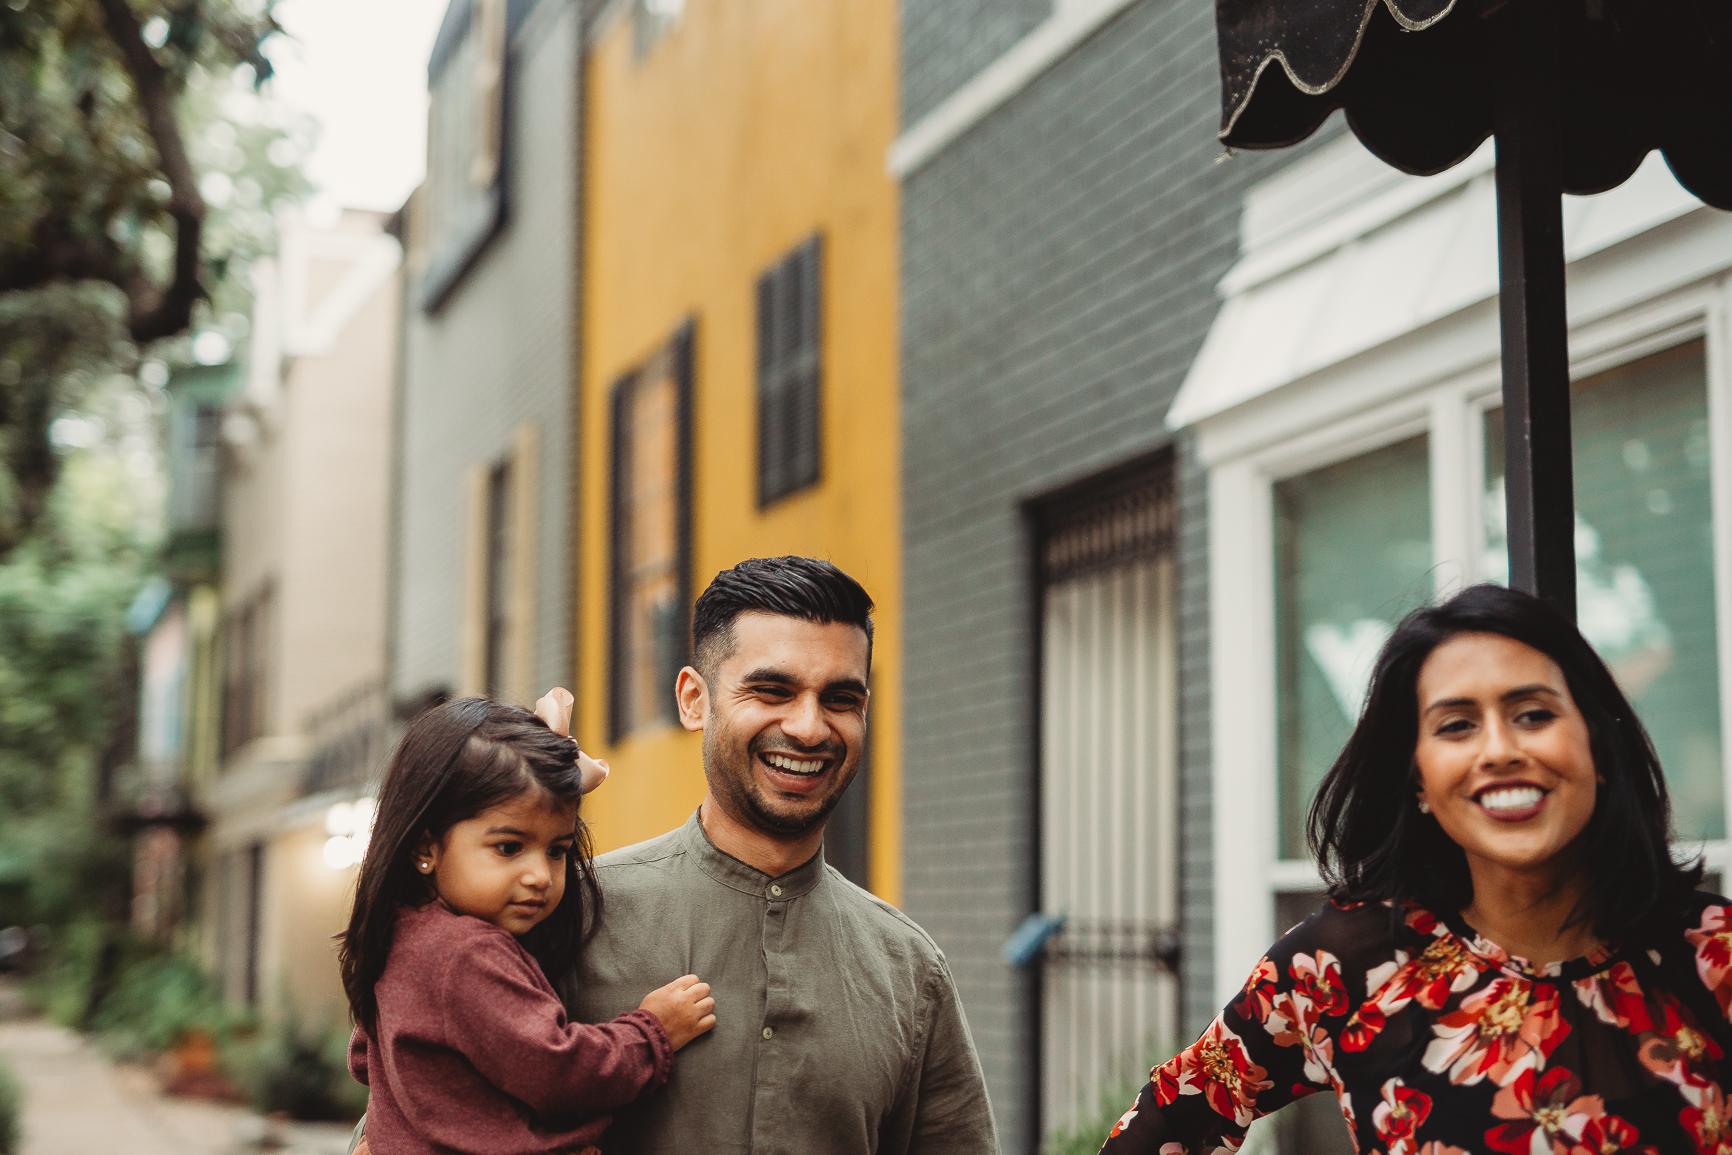 Jesrani-Family-Gallery-Kali-Mikelle-100.jpg